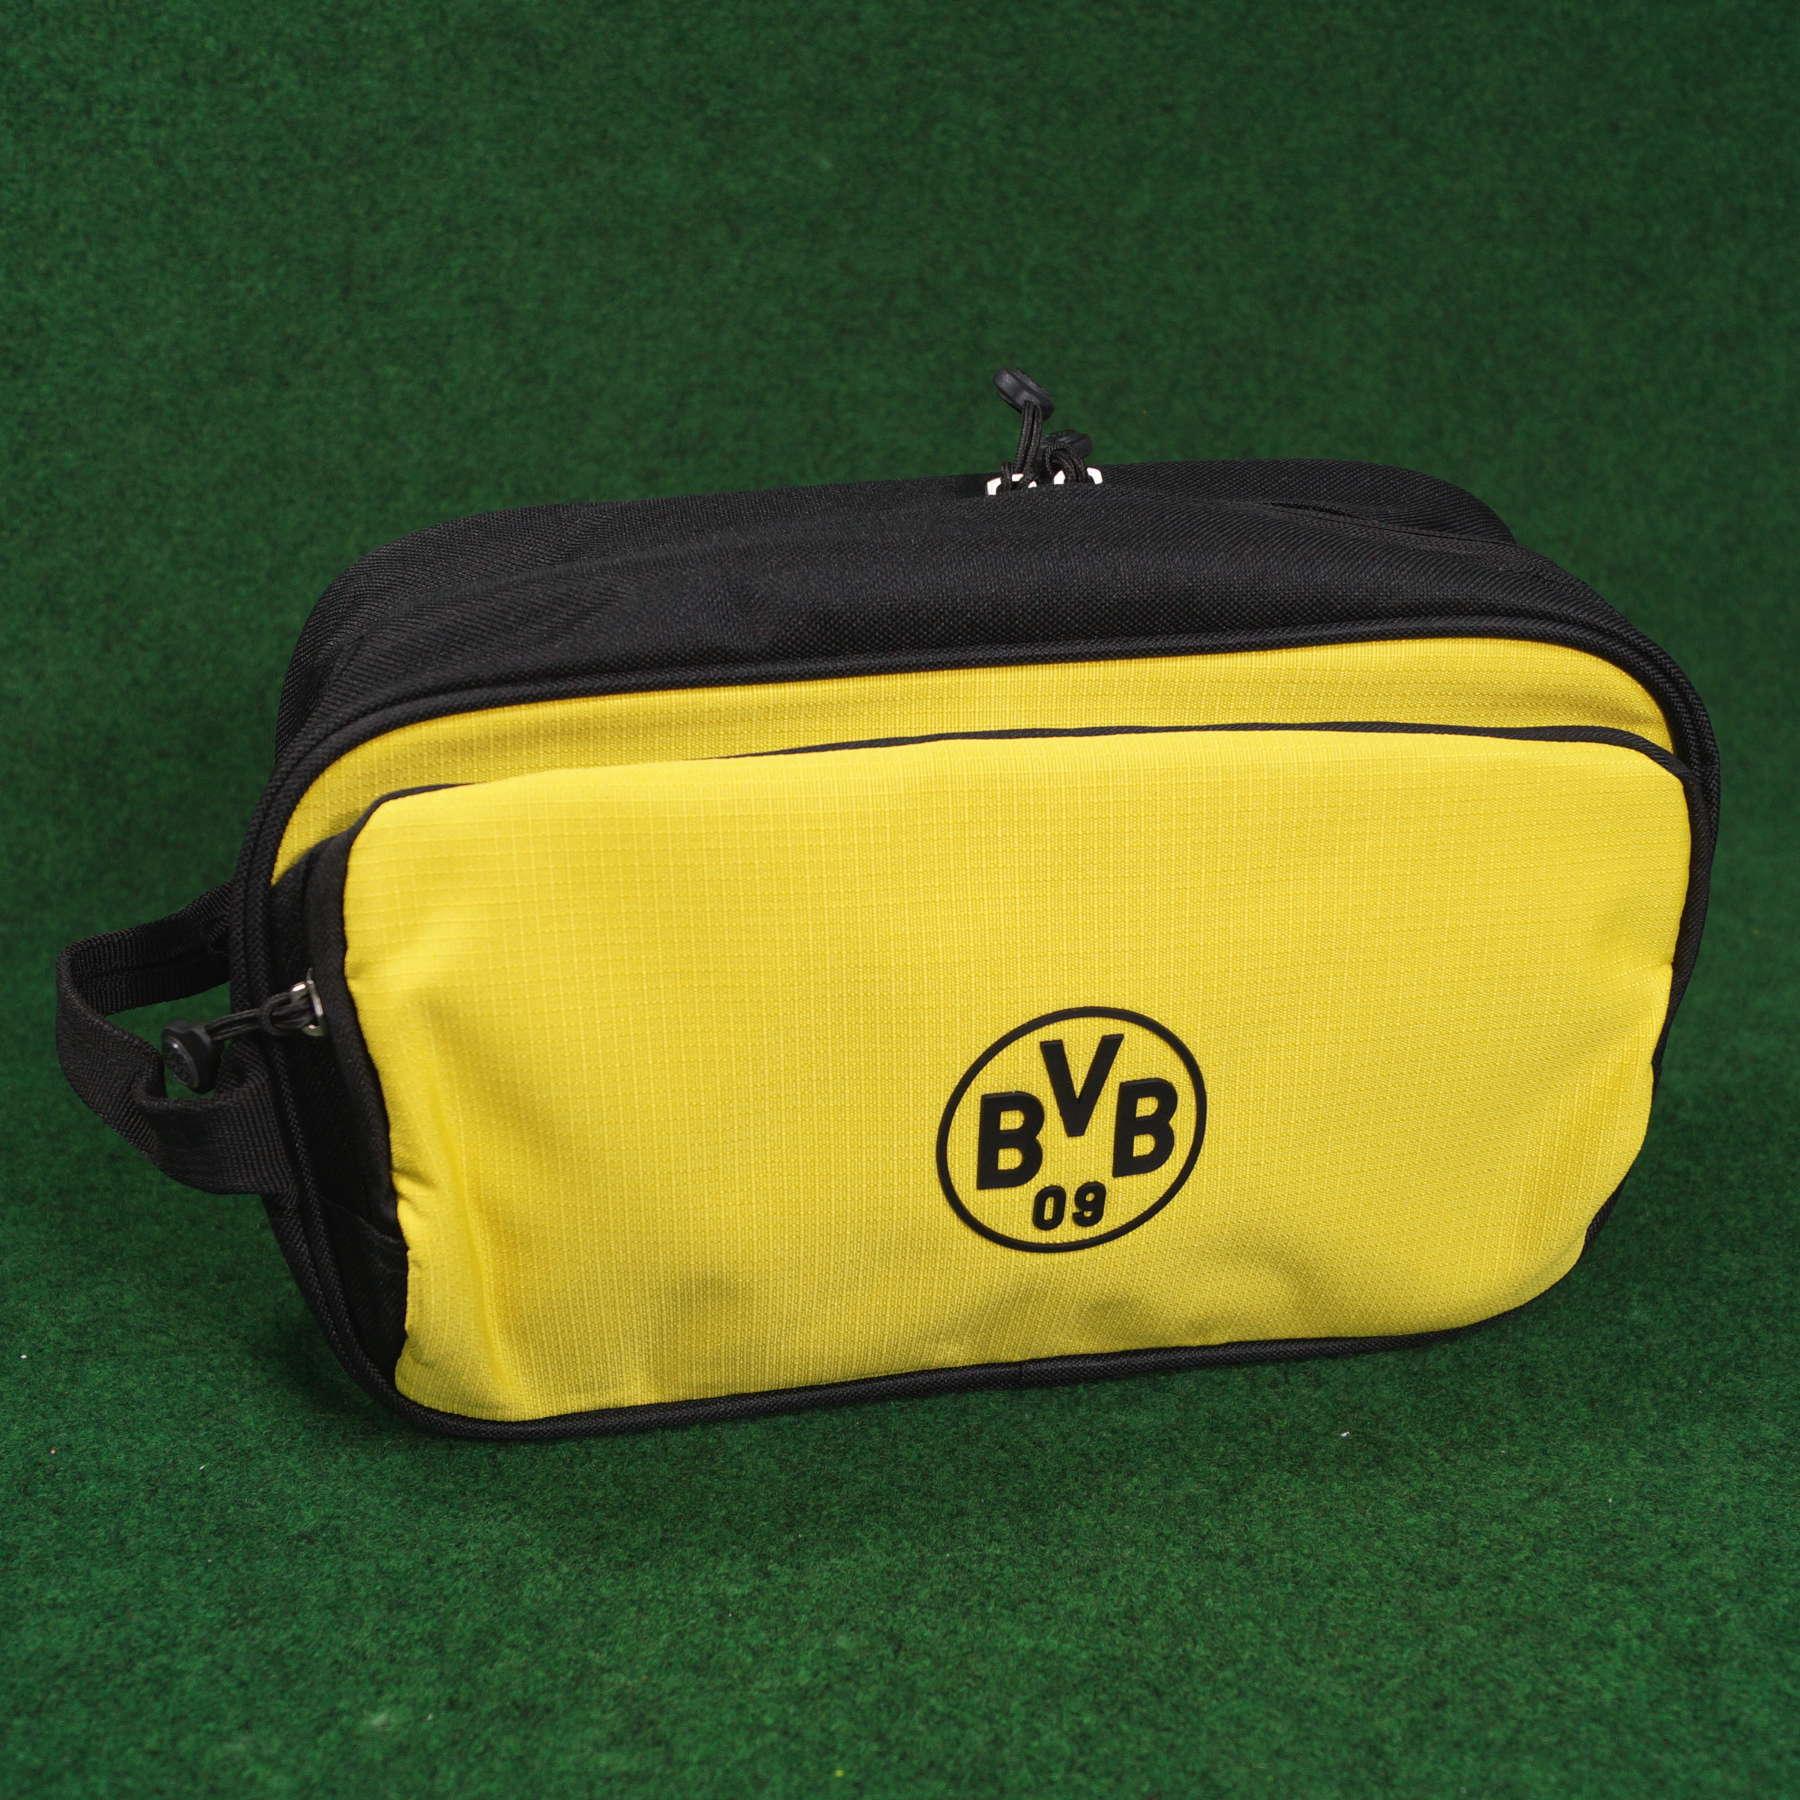 Borussia Dortmund Kulturbeutel schwarzgelb